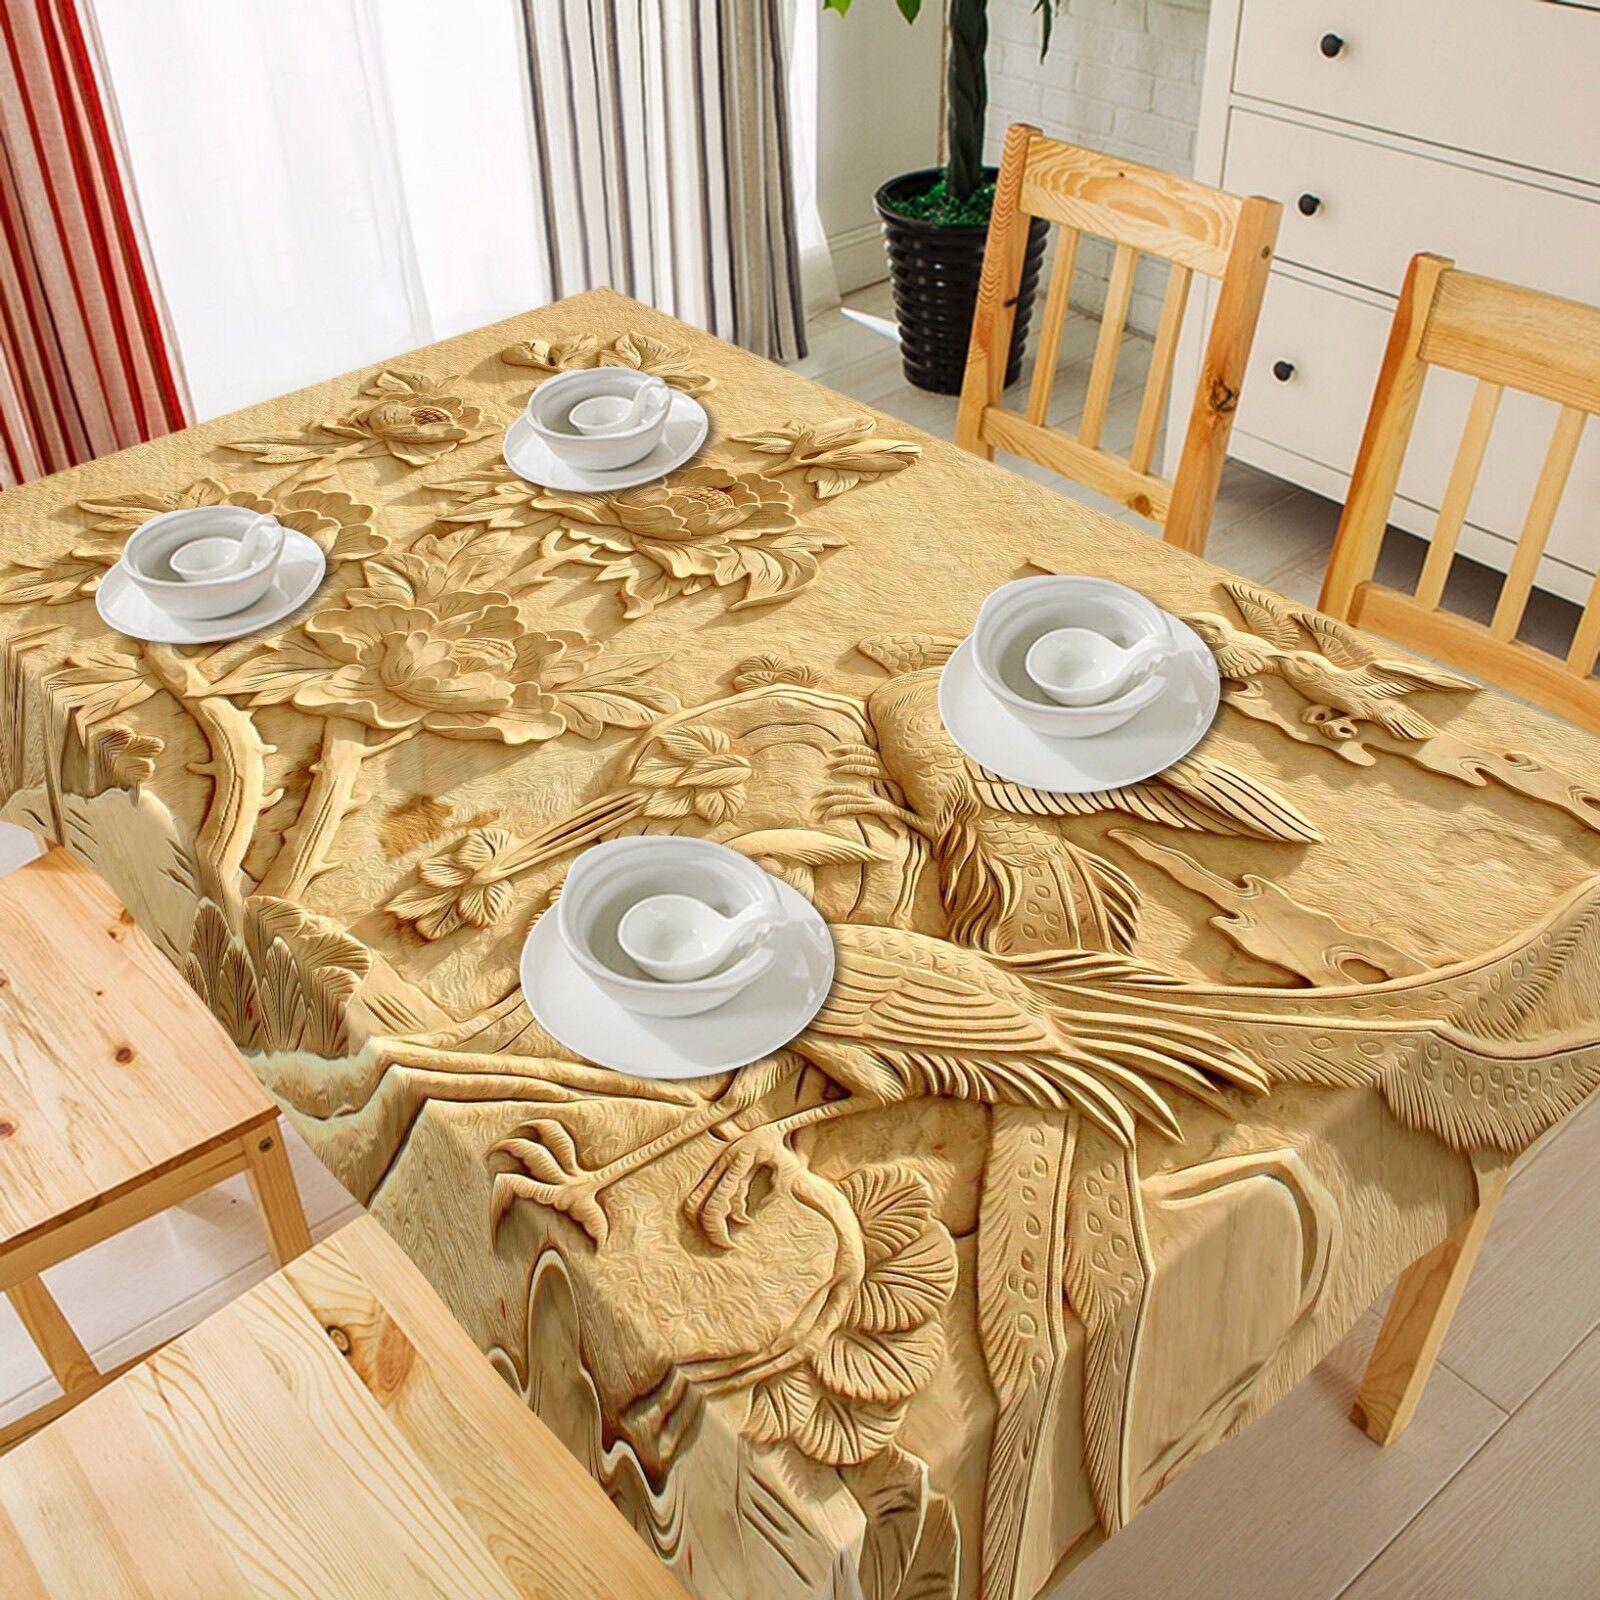 3D Adorn Tablecloth Table Cover Cloth Cloth Cloth Birthday Party AJ WALLPAPER UK Lemon dd708c